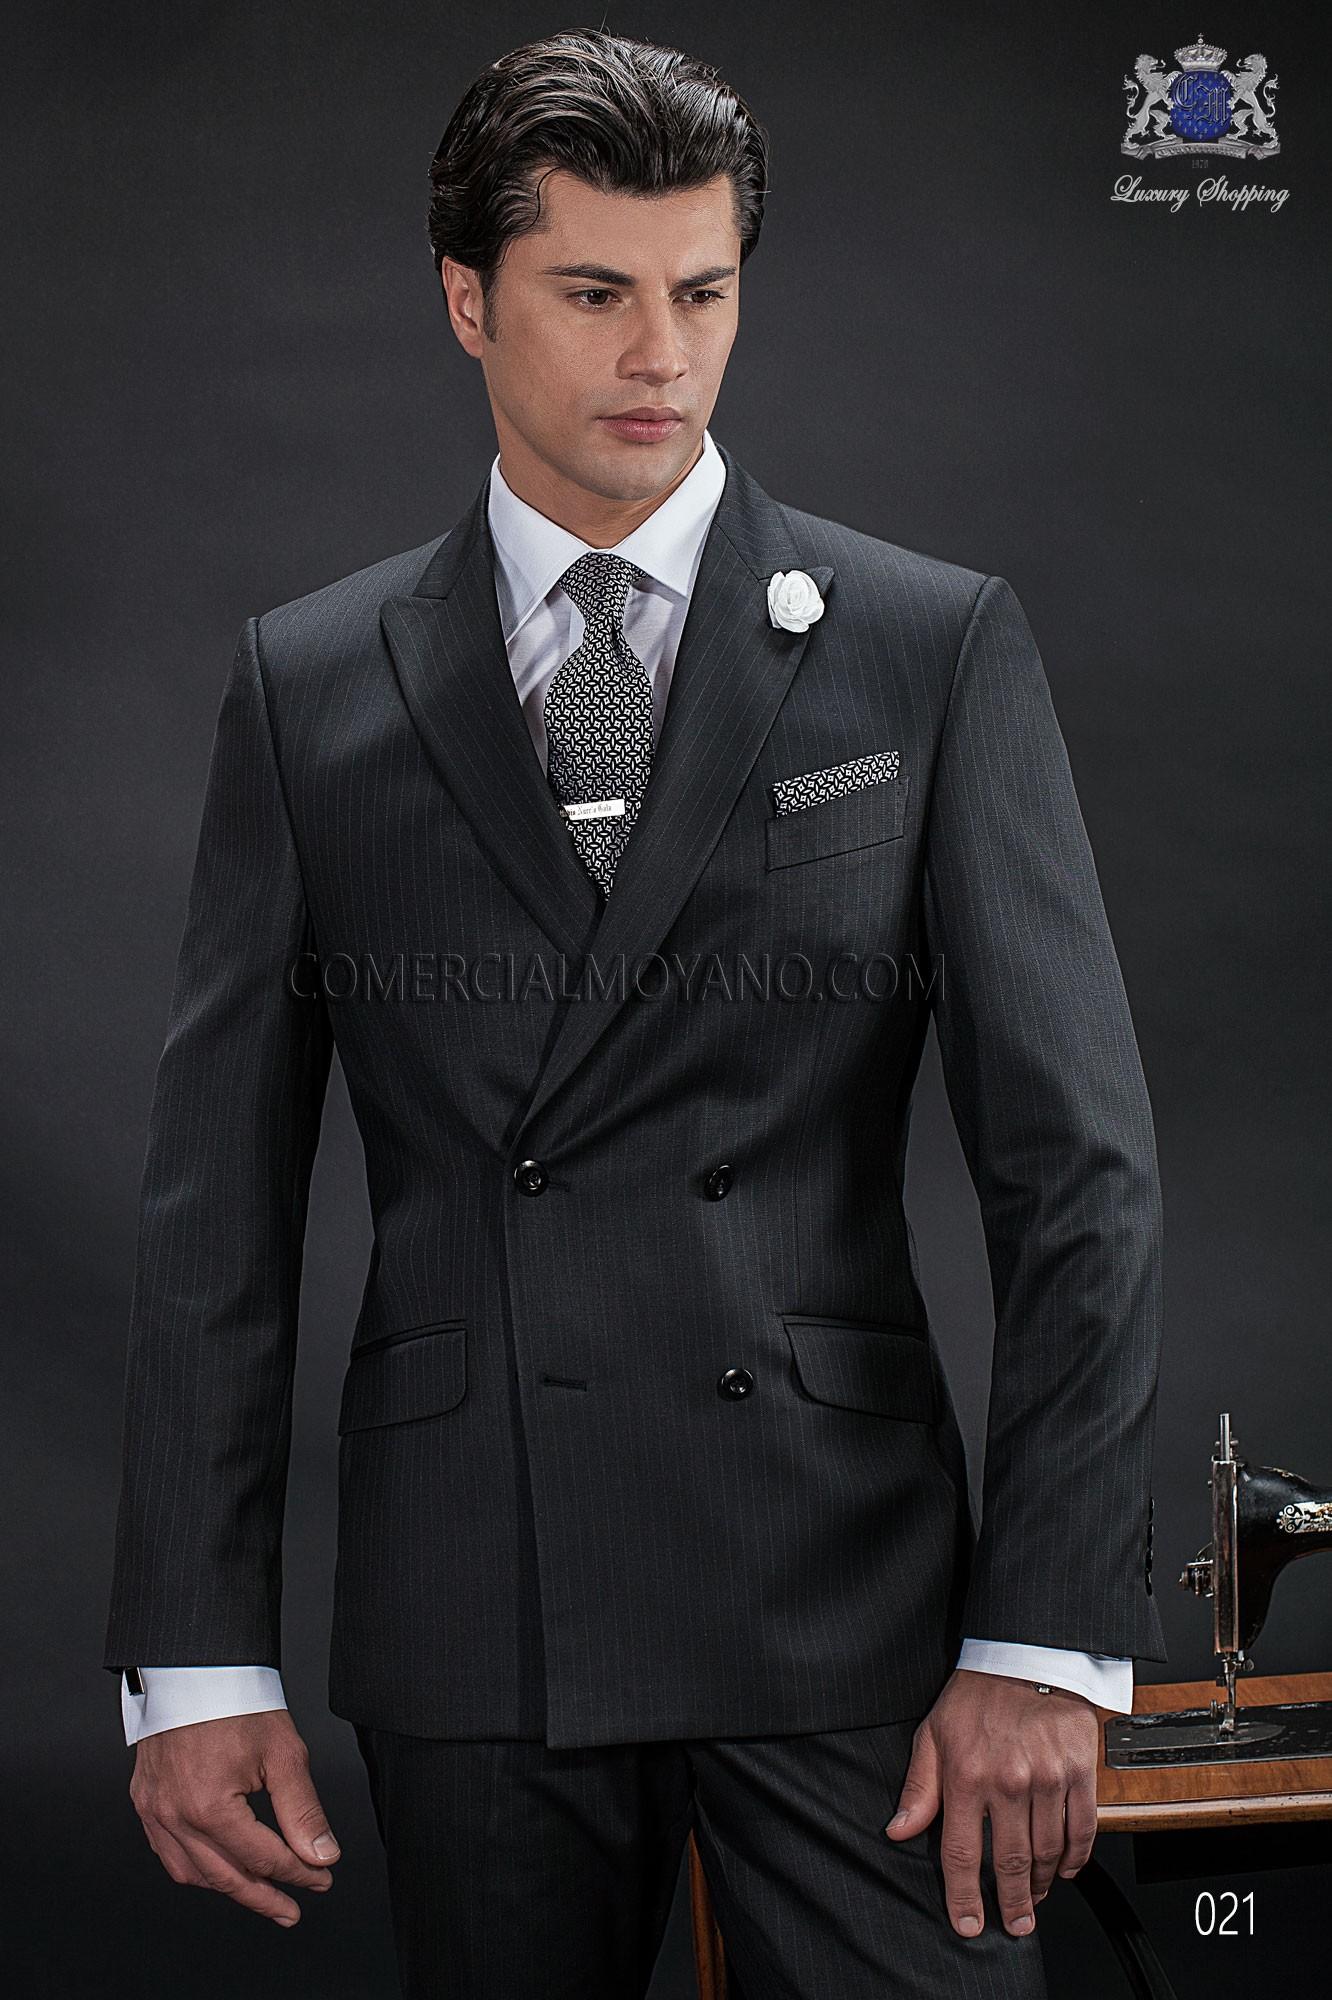 Italian bespoke black wedding suit style 021 Ottavio Nuccio Gala.